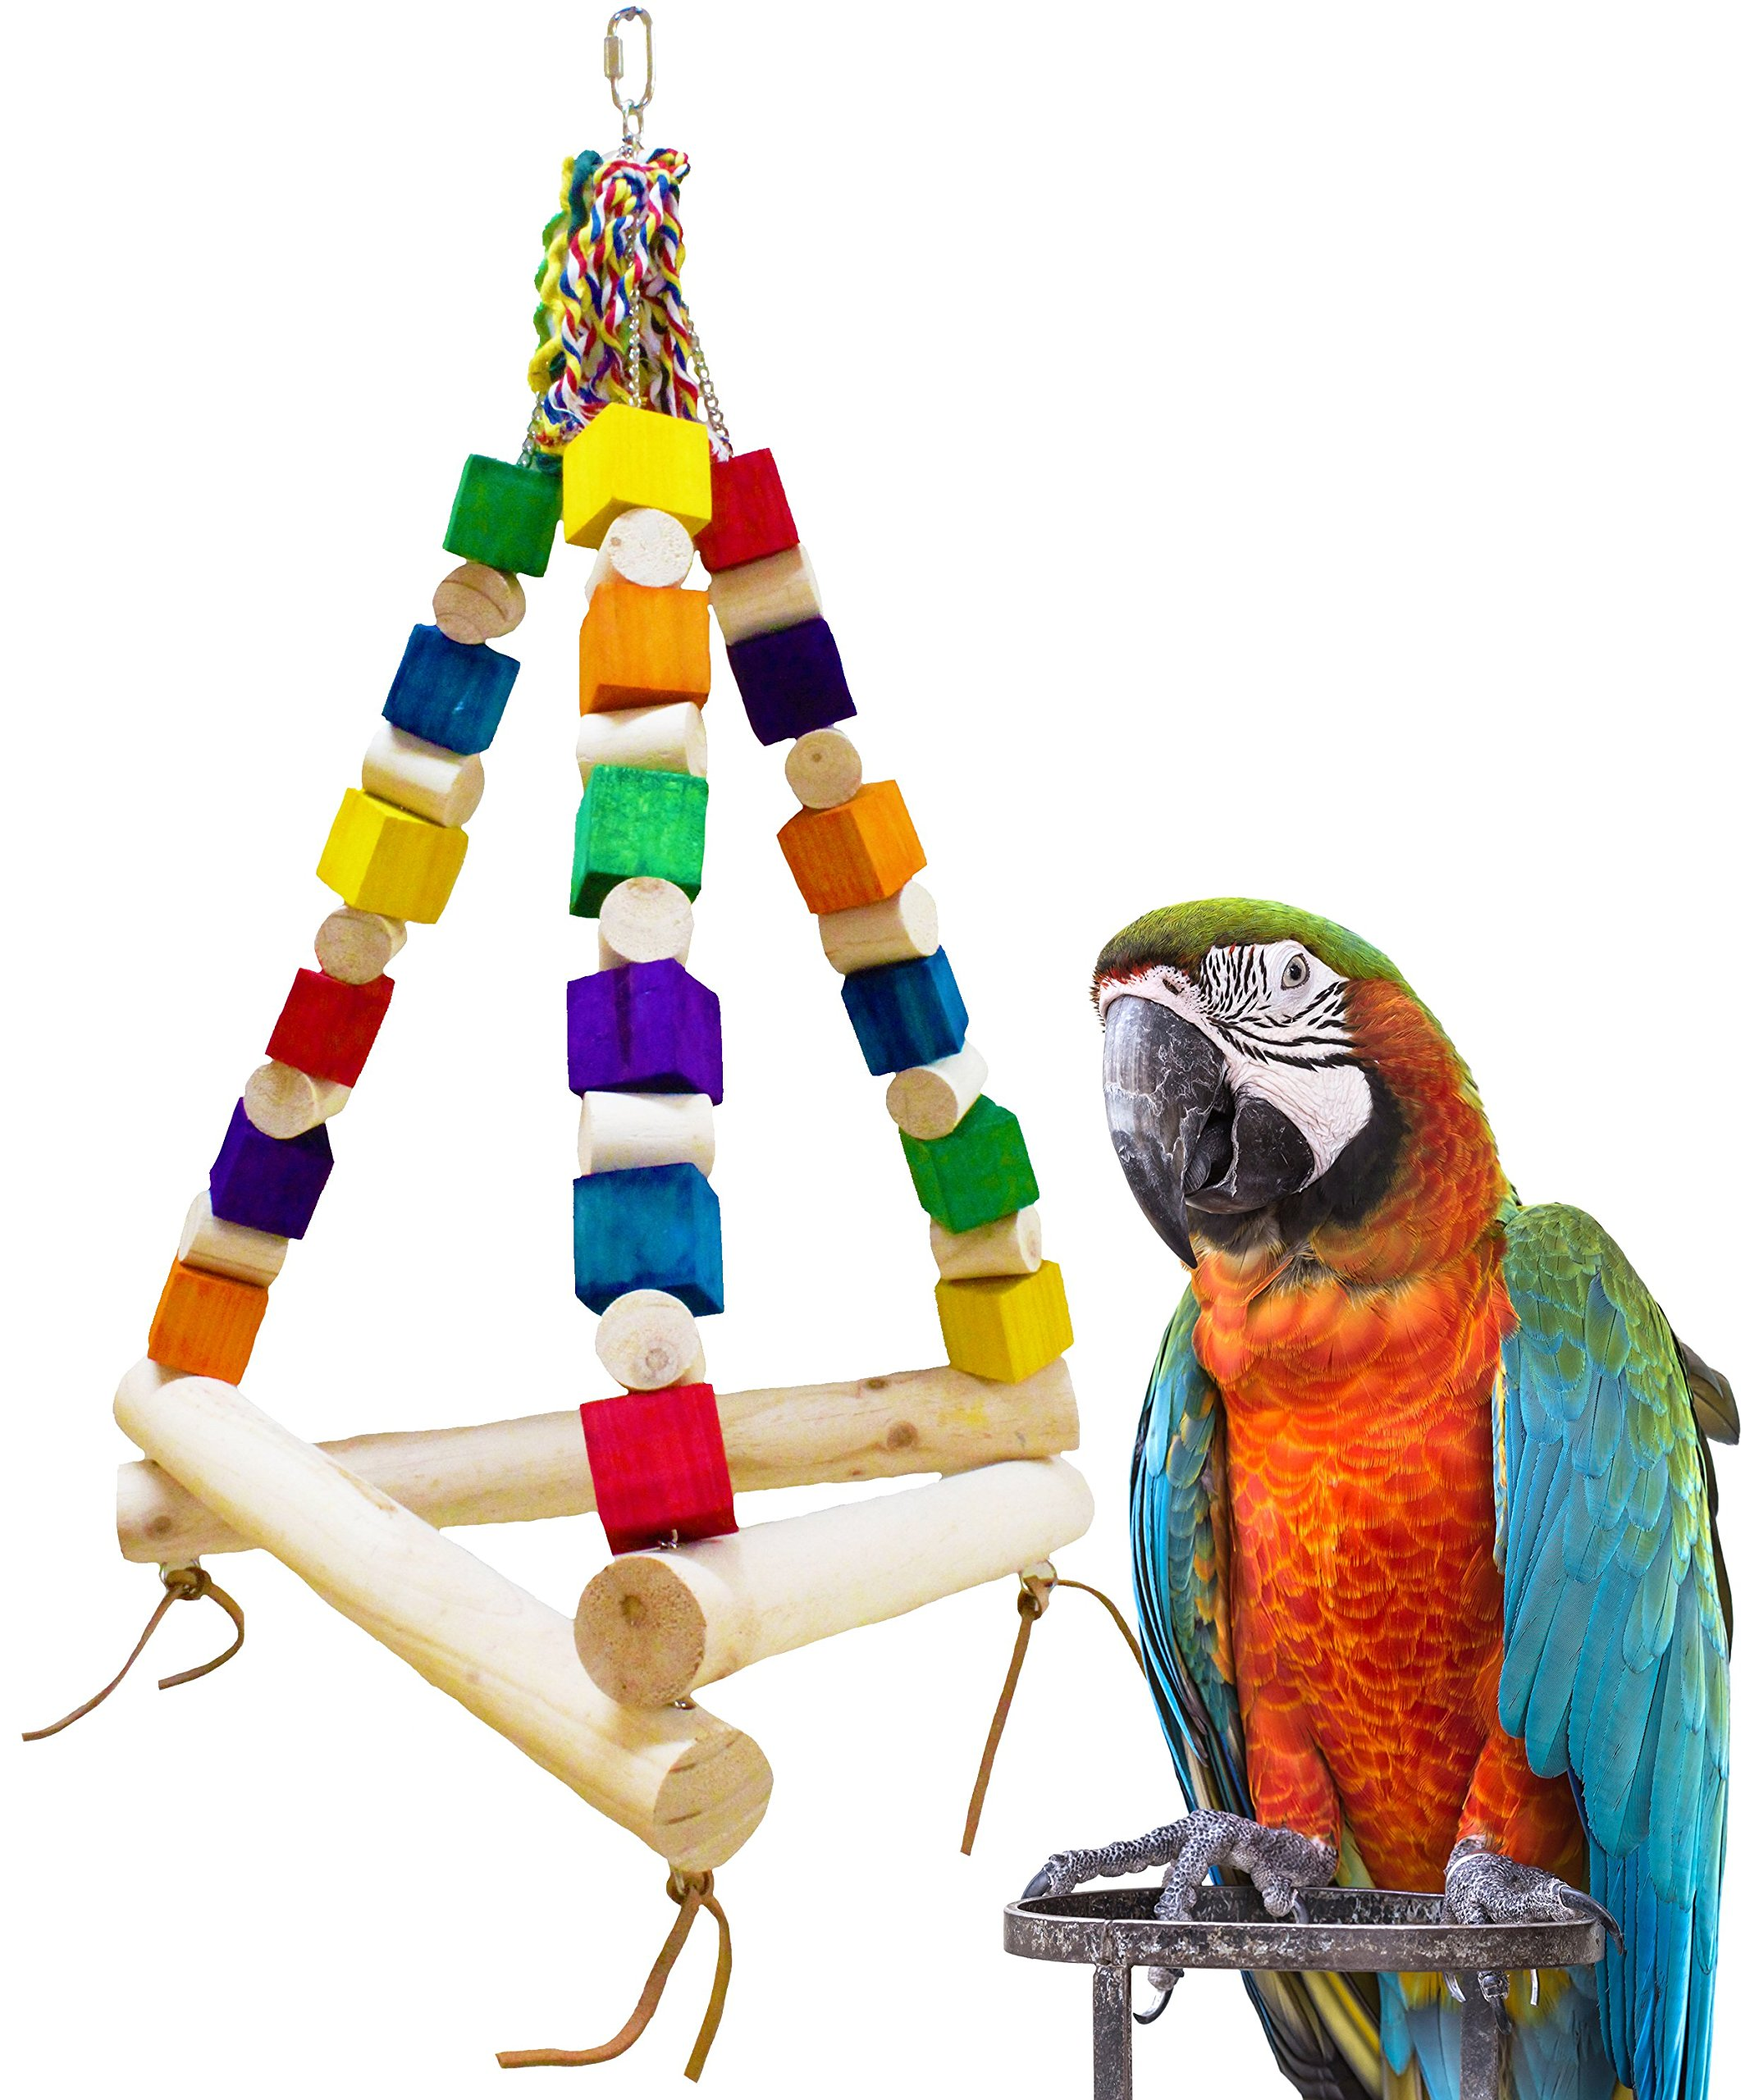 Bonka Bird Toys 1297 Jumbo Swing Tri Parrot Bird Cage Toys Cages Toy Chew Amazon Macaw Cockatoo